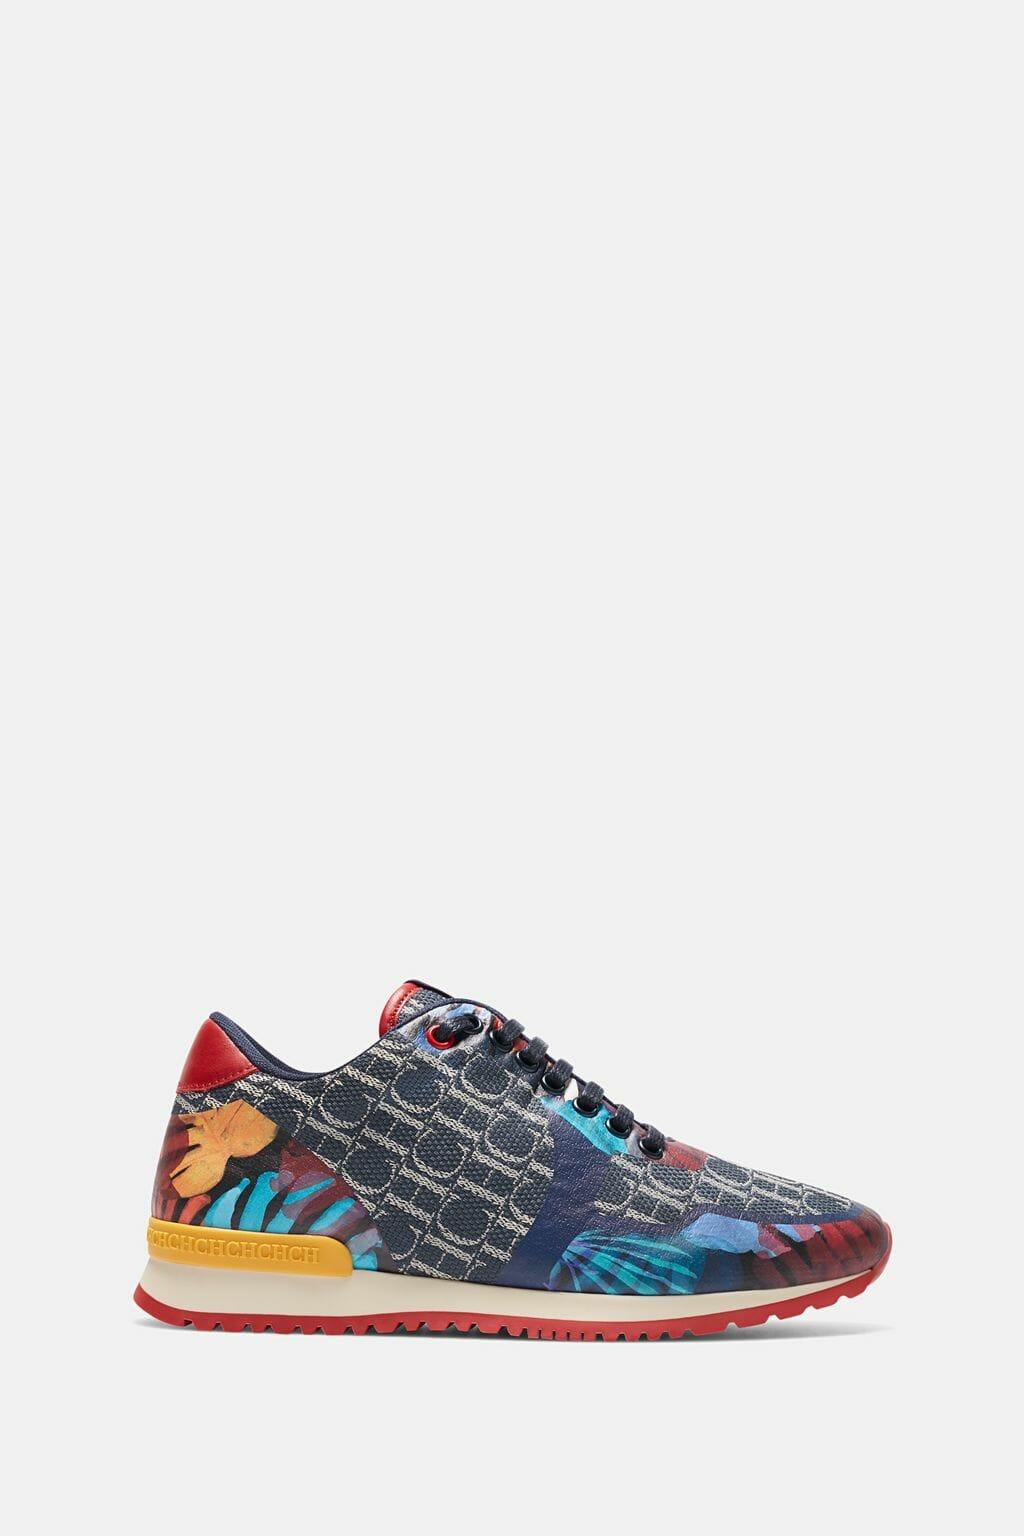 CH-Carolina-herrera-shoes-collection-Spring-Summer-2018-shoe-79